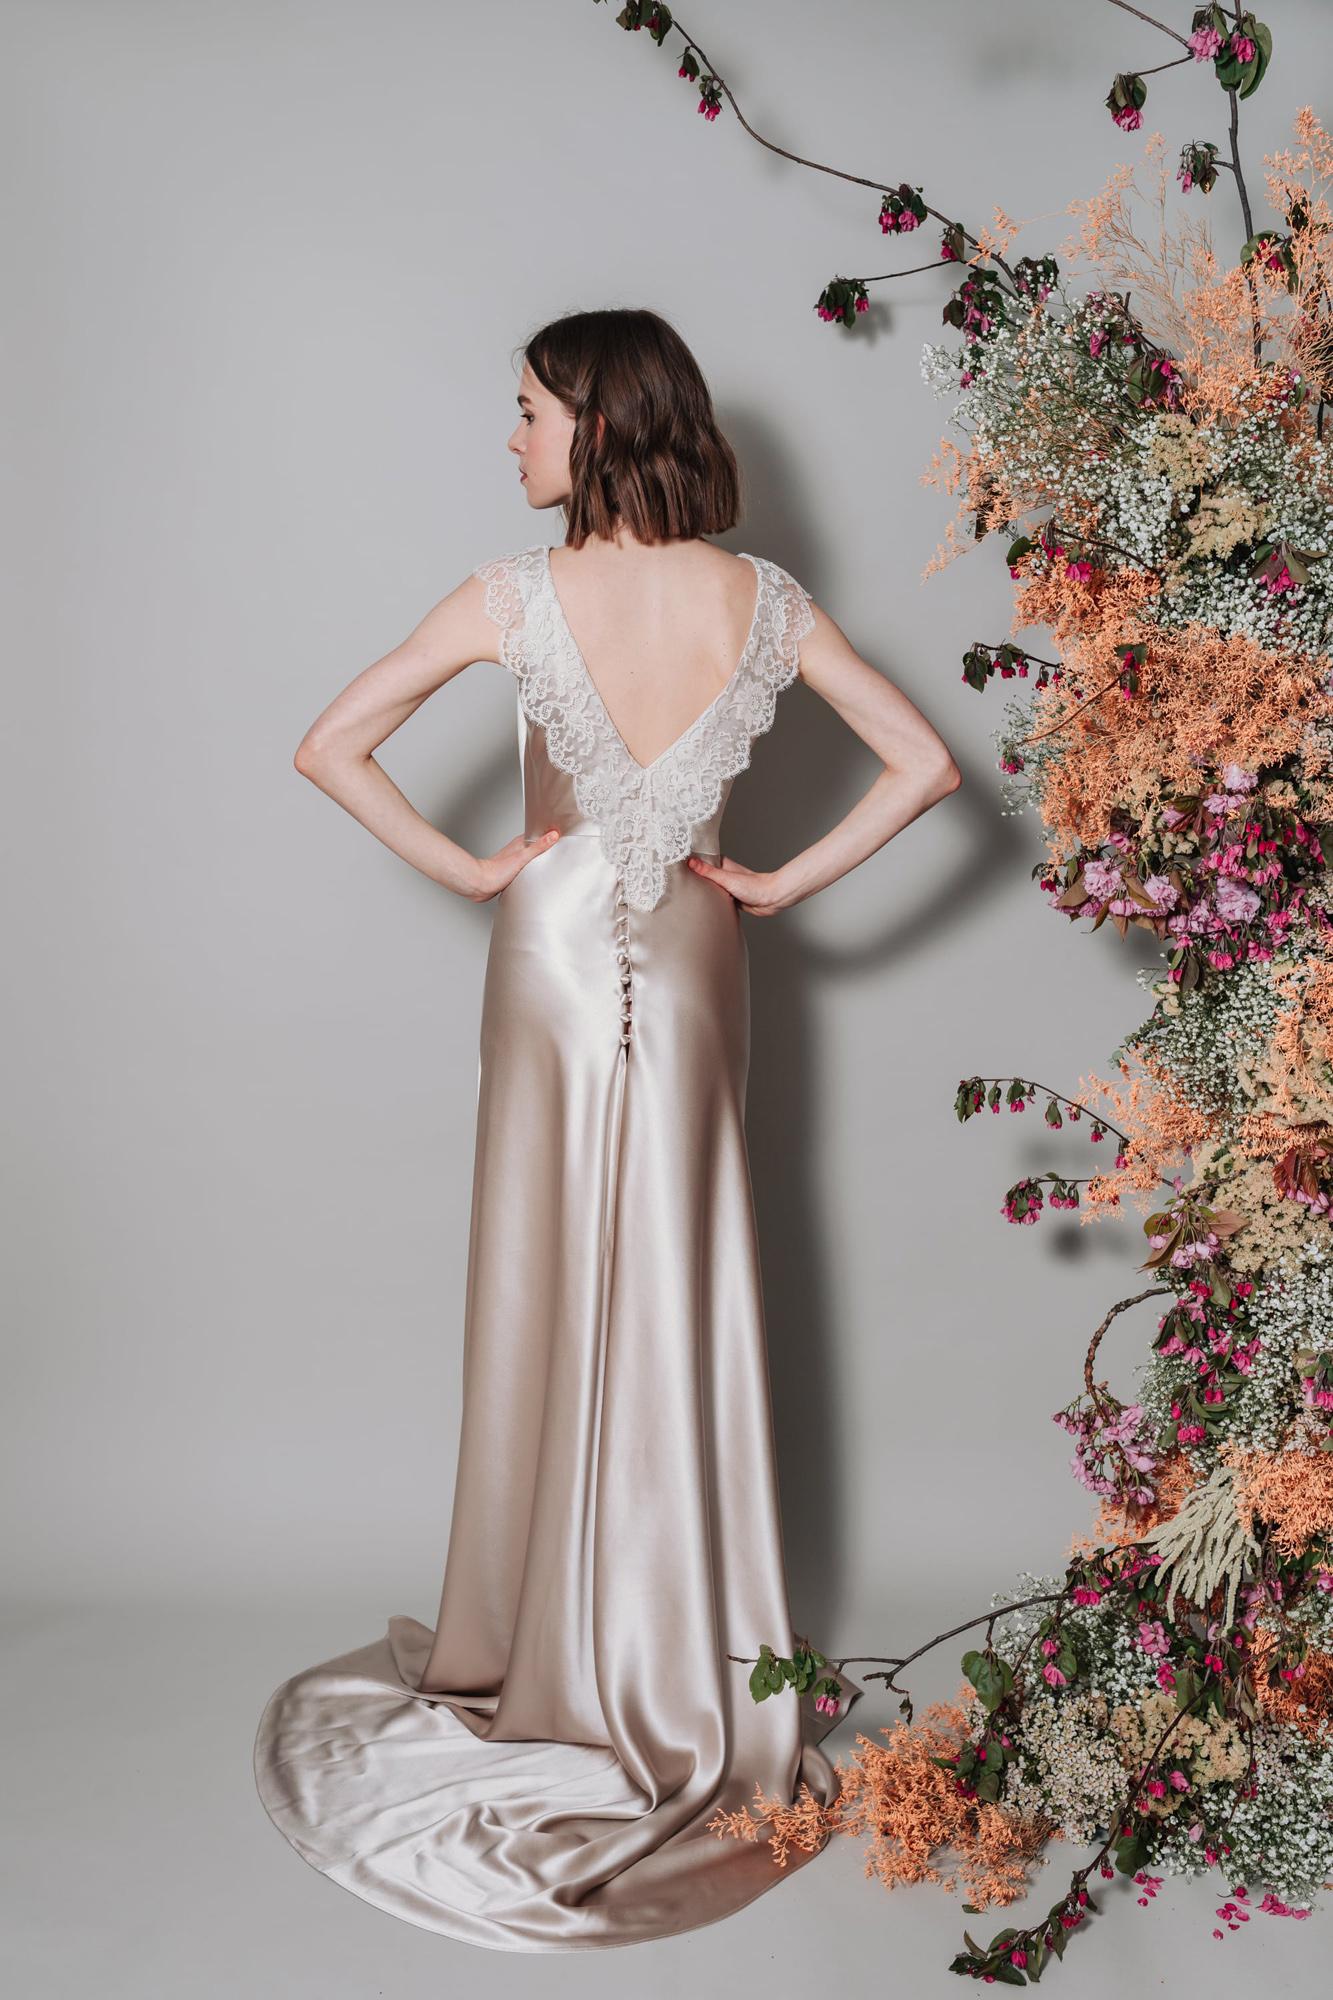 Kate-Beaumont-Sheffield-Honeysuckle-Bias-Cut-Silk-Panelled-Wedding-Gown-15.jpg